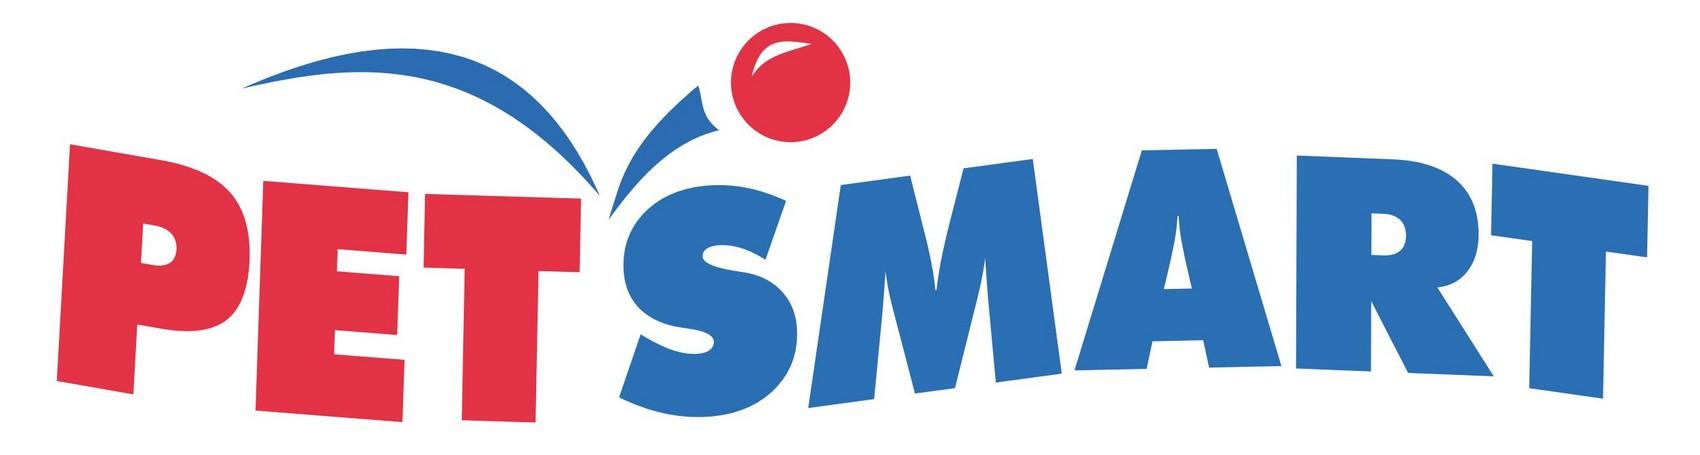 PetSmart-logo.jpg